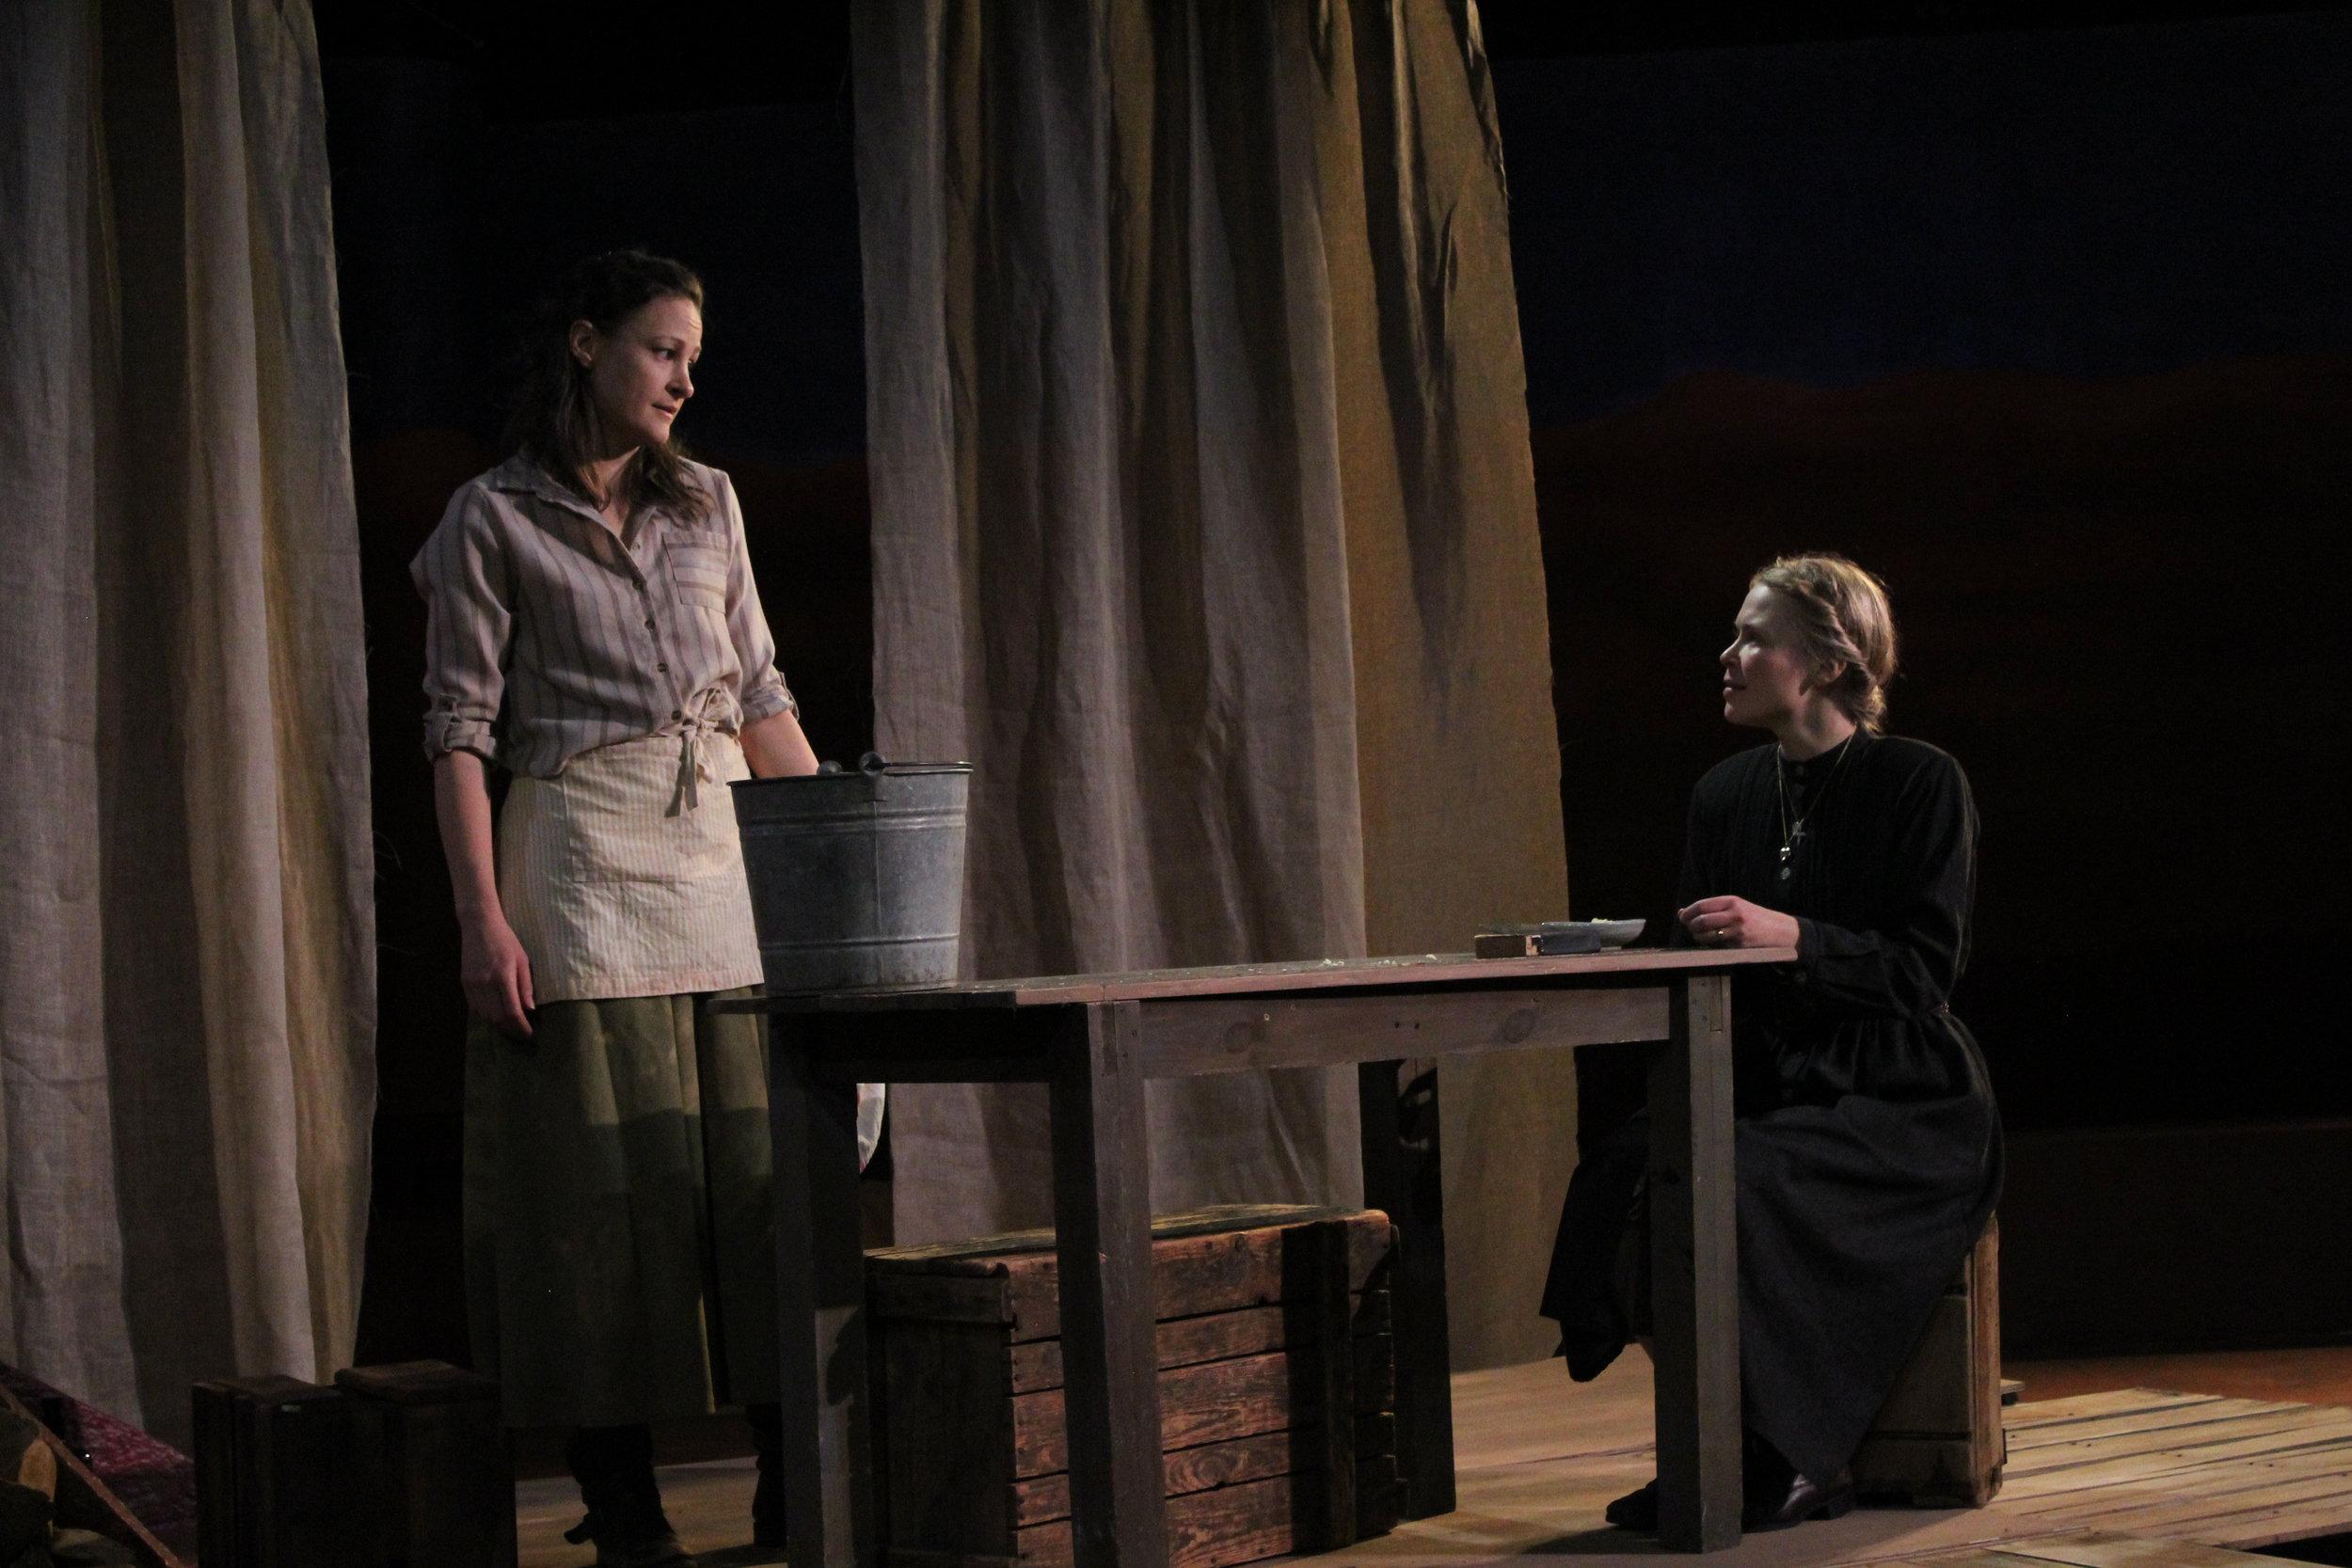 Leah Gabriel (Nora) and Jillian Geurts (Elizabeth)